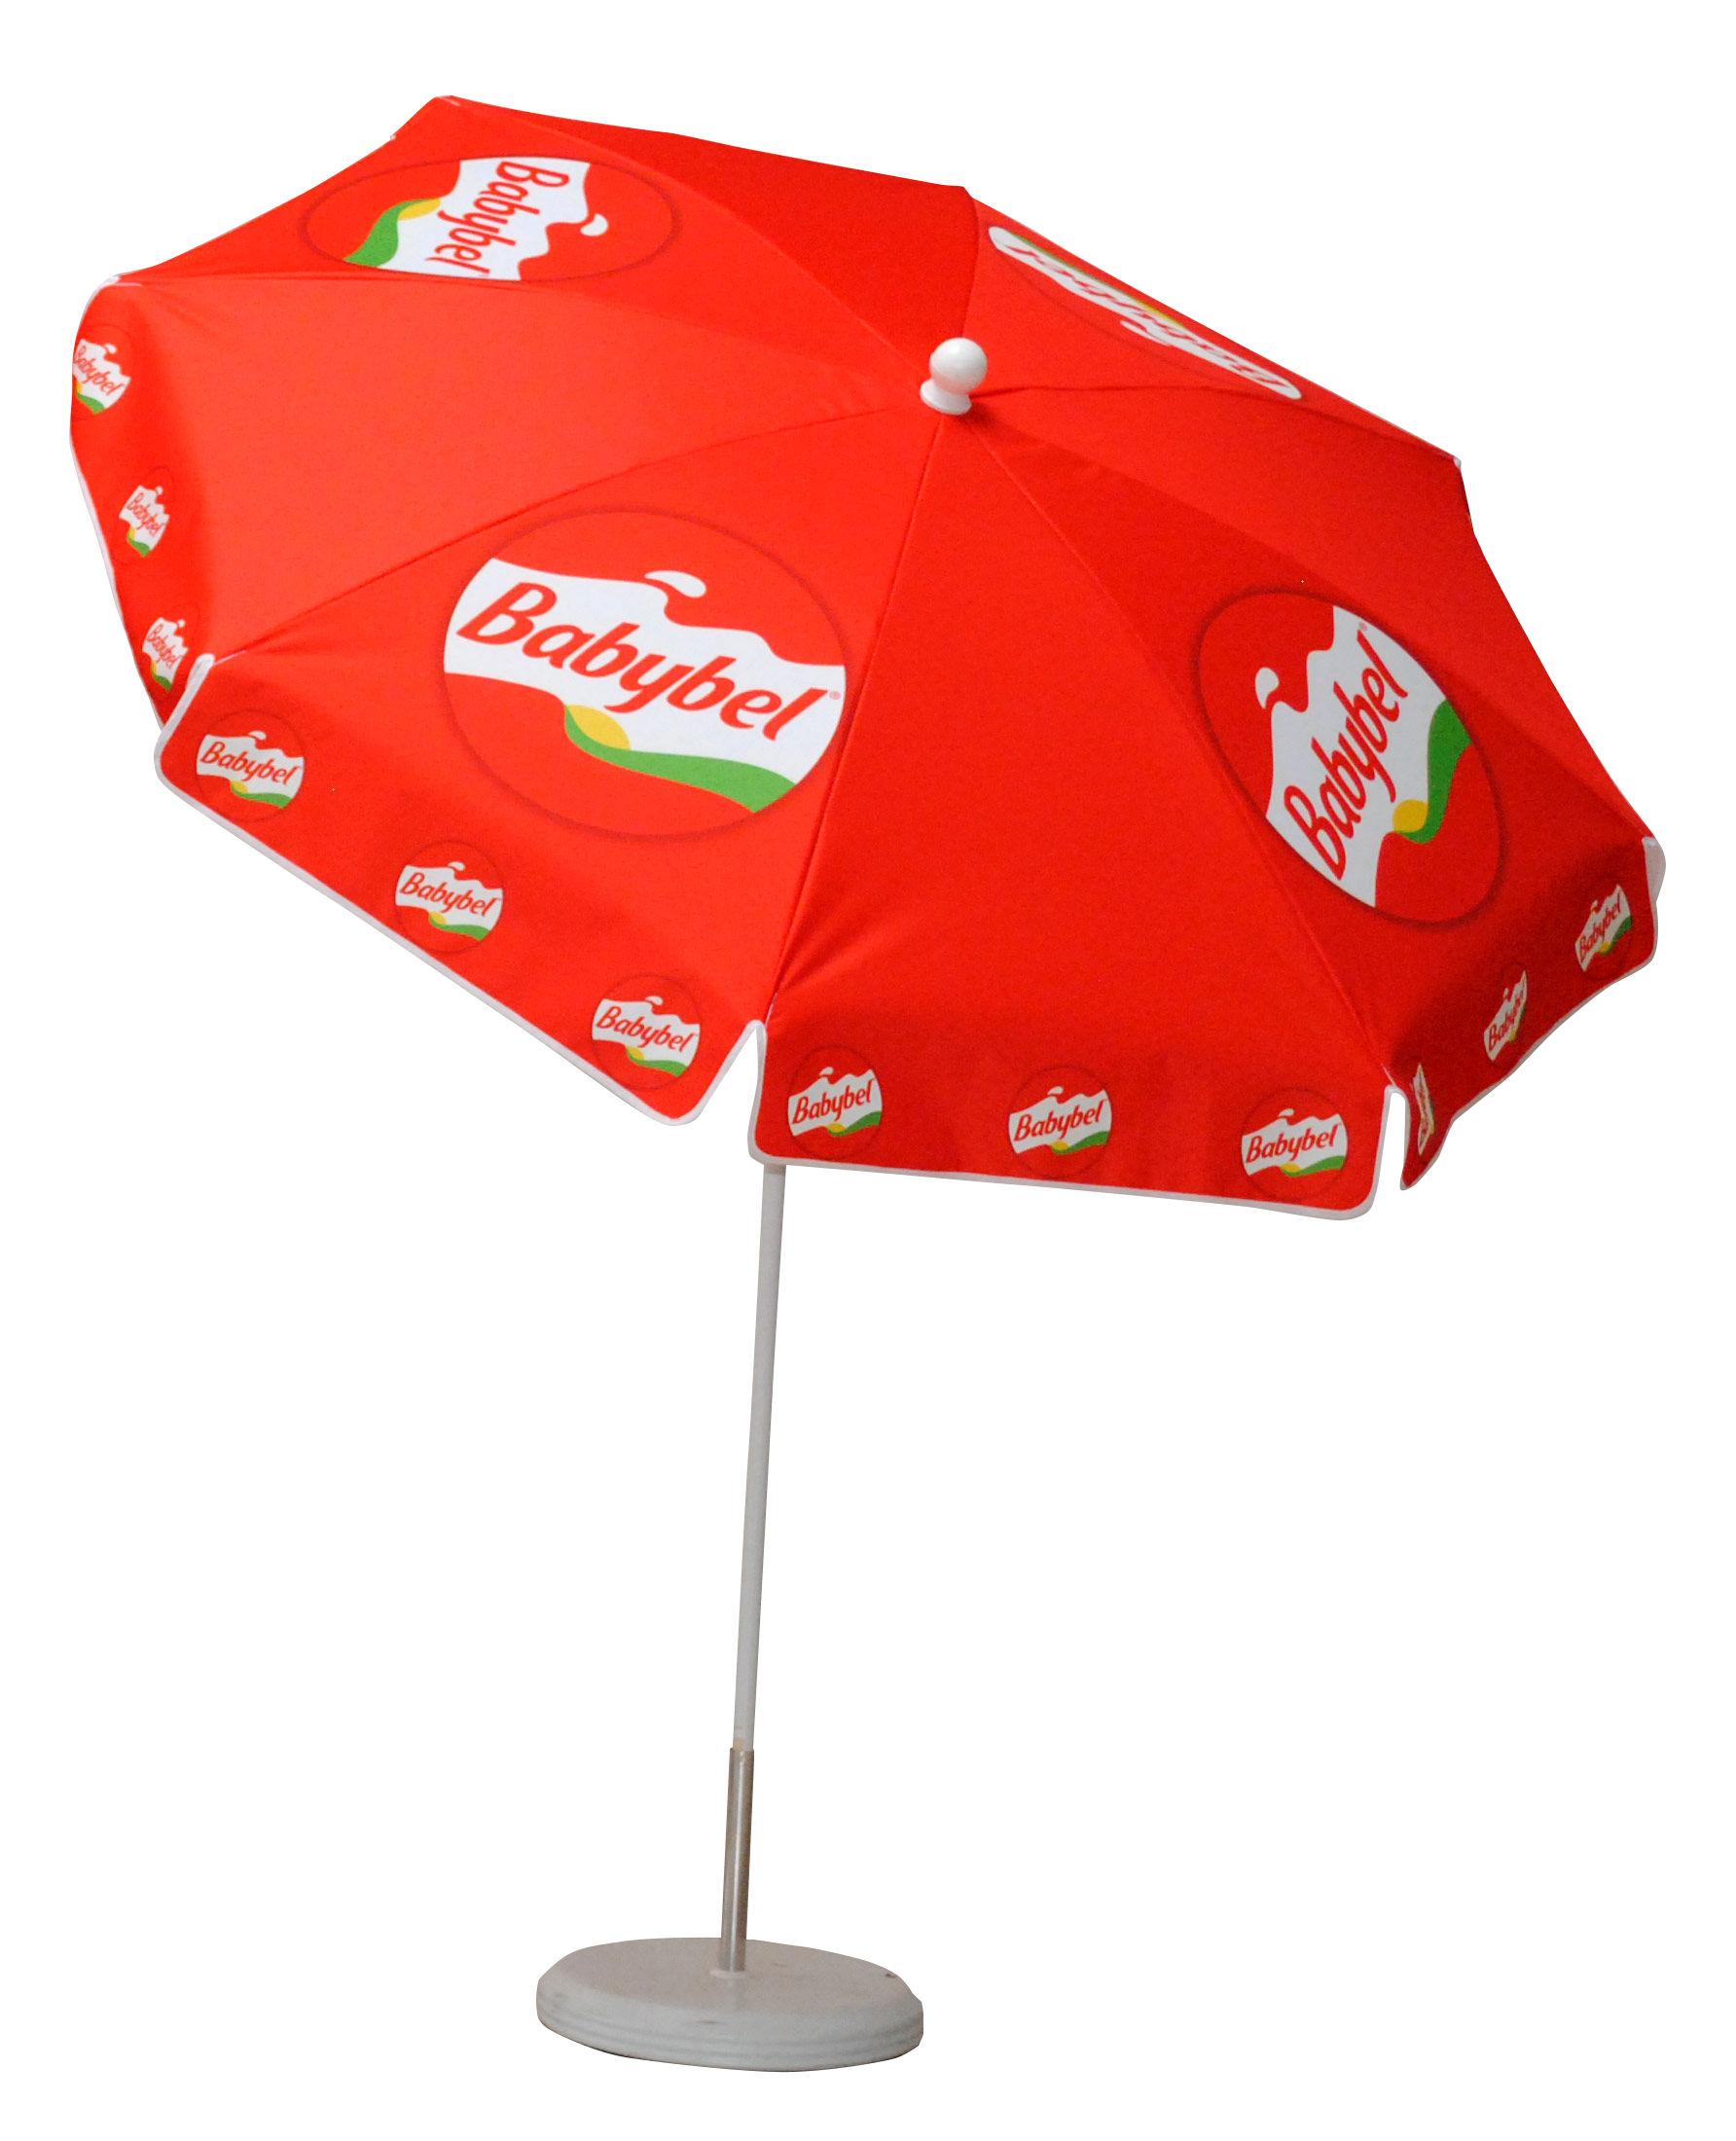 bedruckter Sonnenschirm Werbeschirme-Rund-2m-Babybel (1) (2)